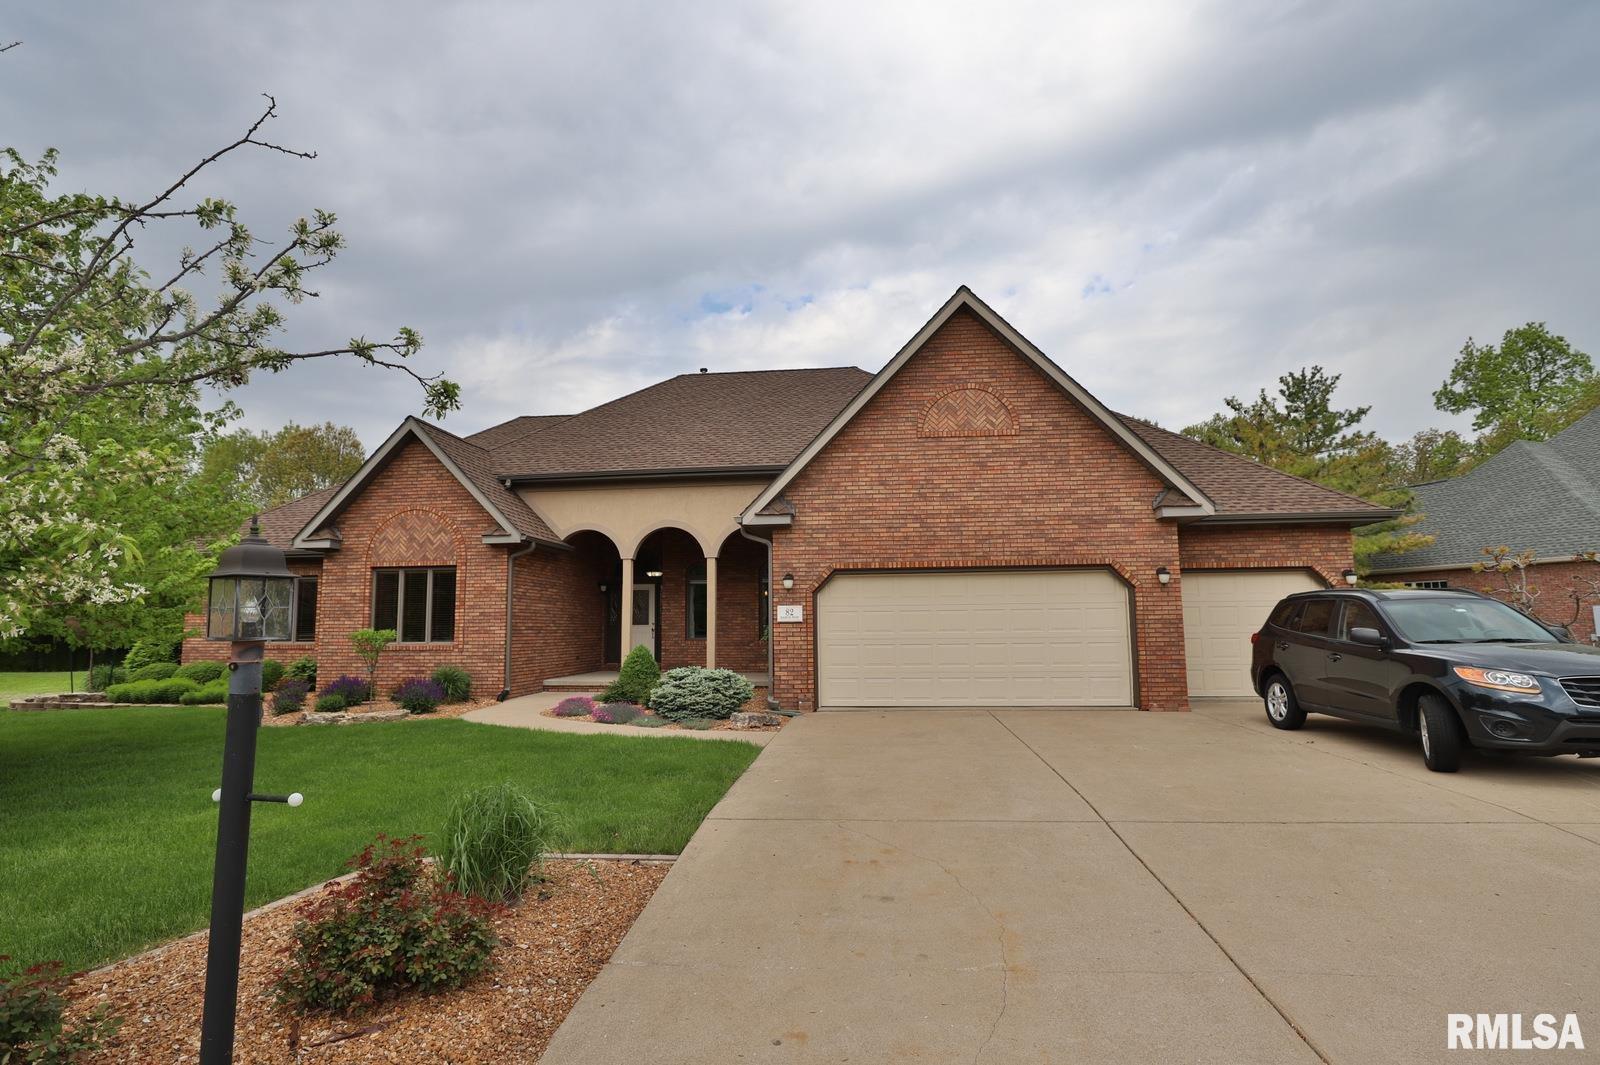 82 DIAMOND Property Photo - Morton, IL real estate listing